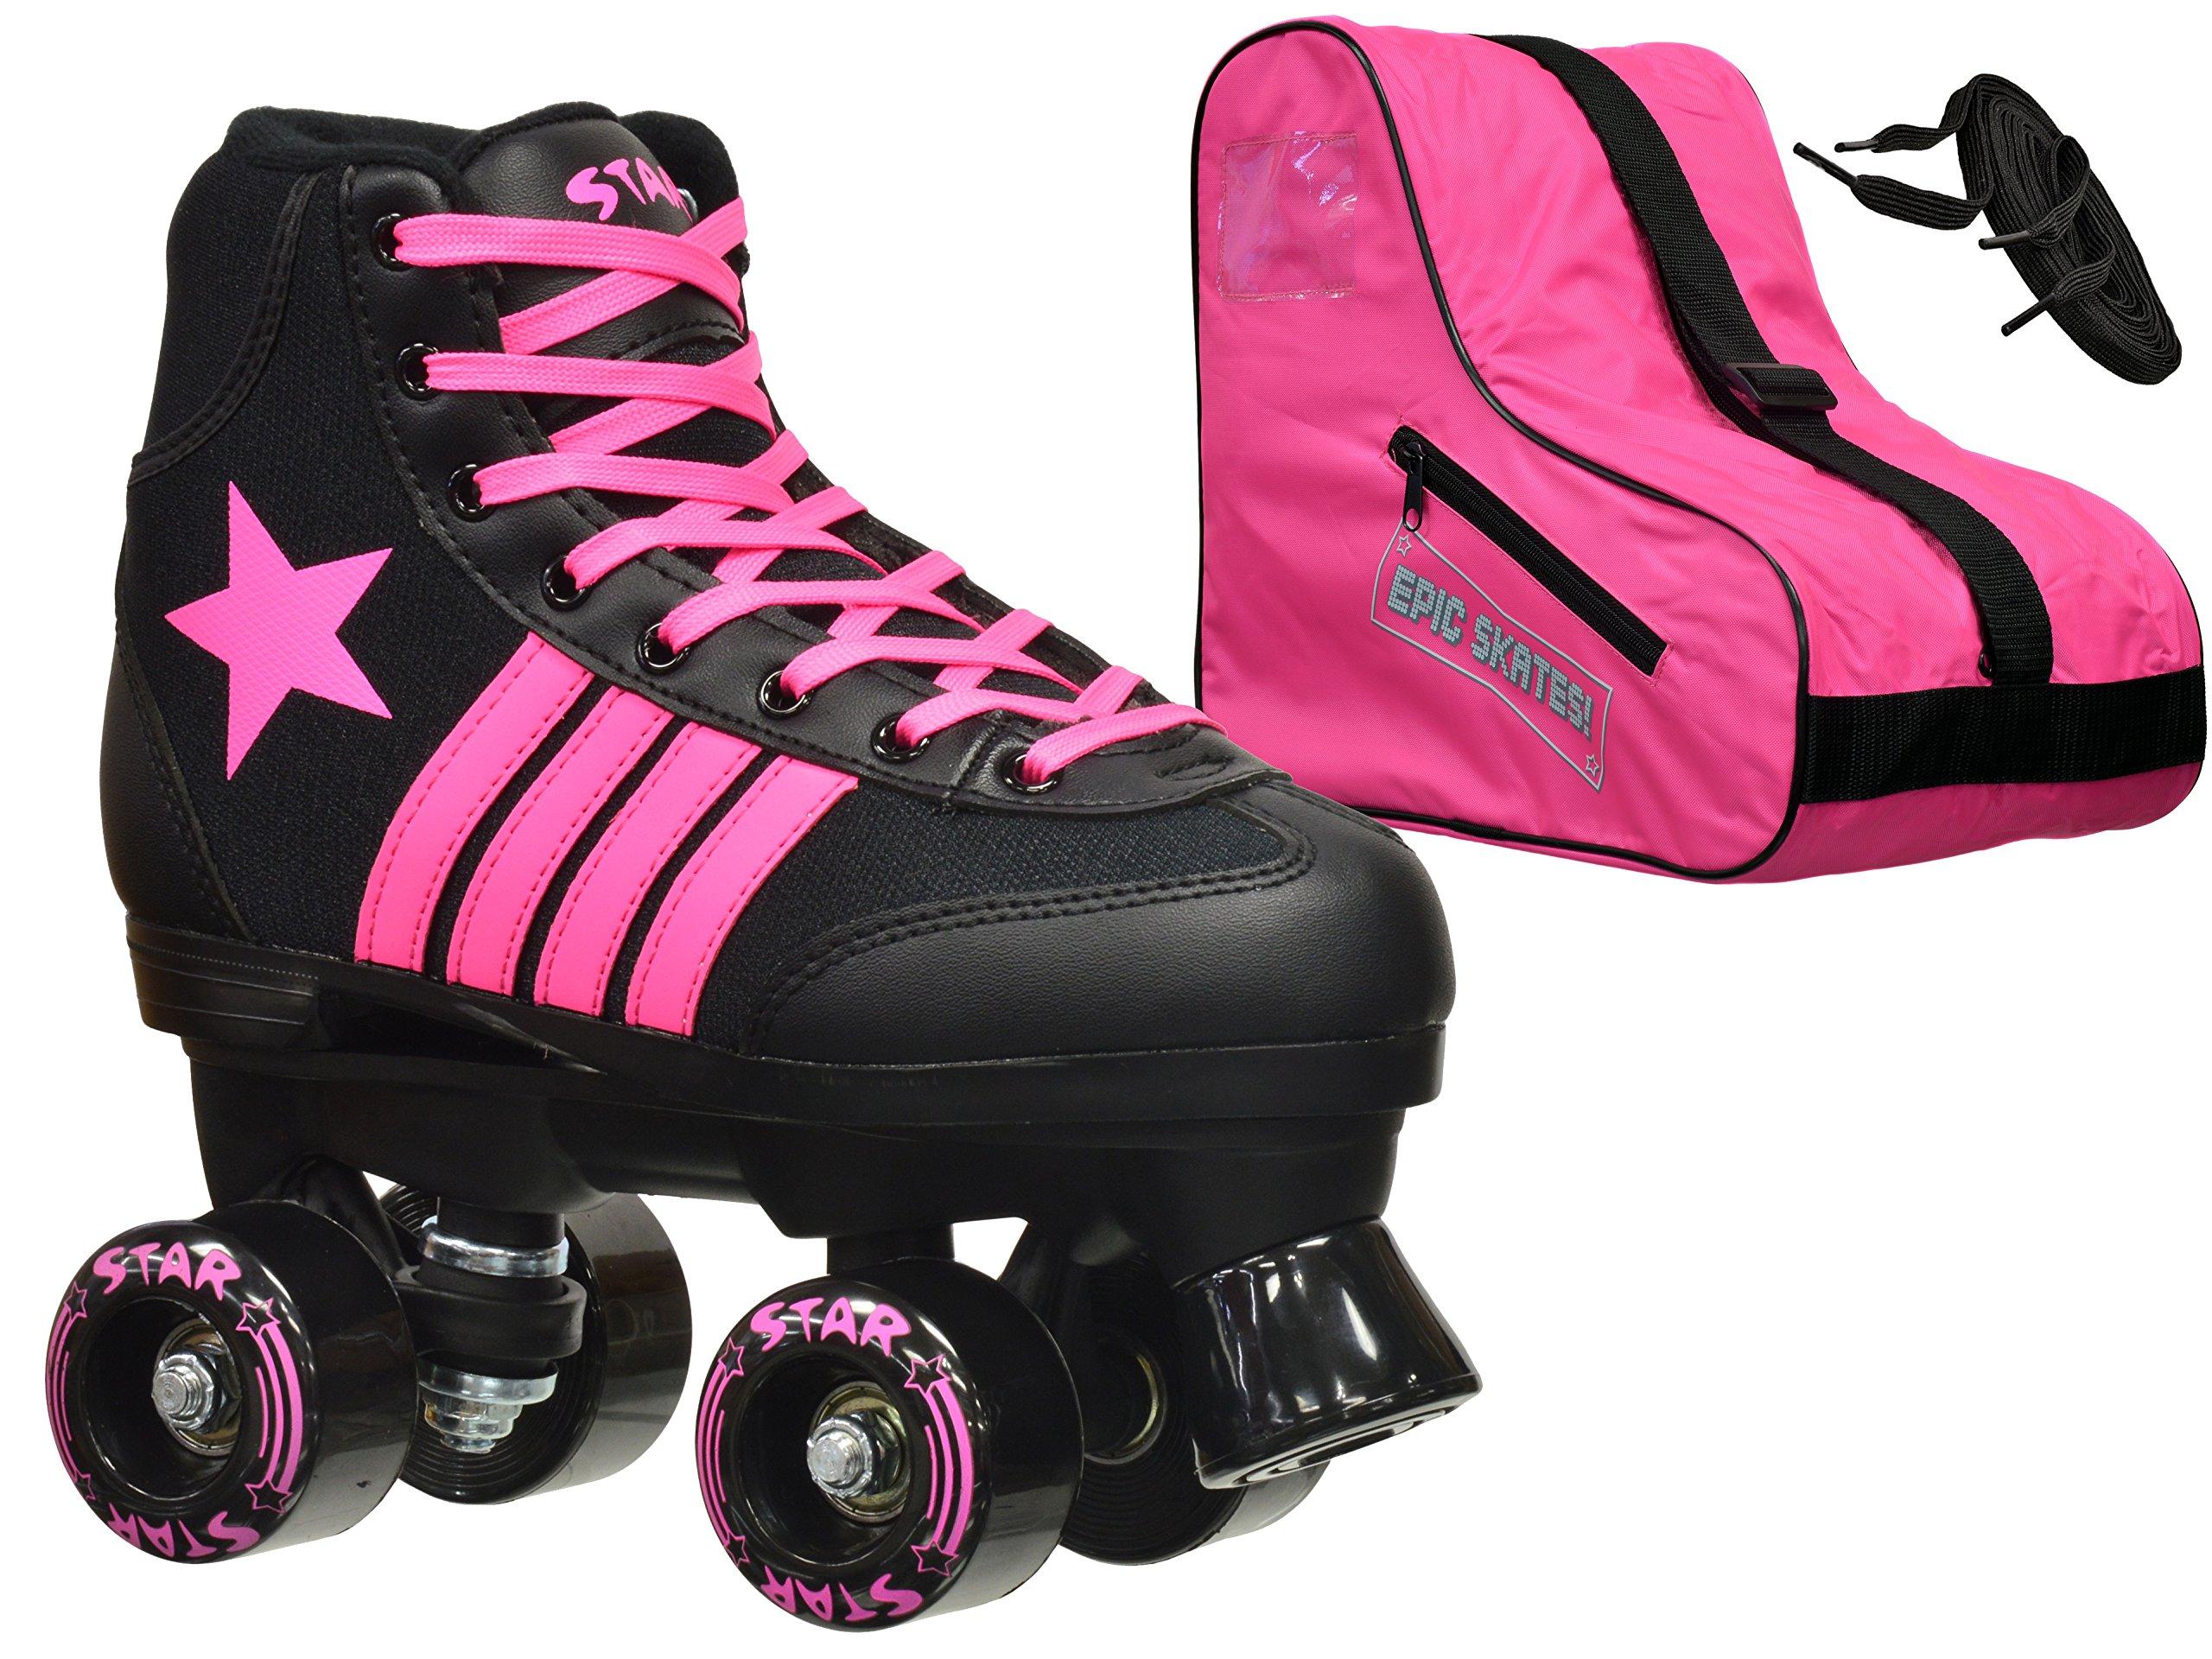 New! 2016 Epic Star Vela Indoor Outdoor Classic High-Top Quad Roller Skate 3 Pc. Bundle w/ Bag & Laces (Pink & Black) (Adult 6)